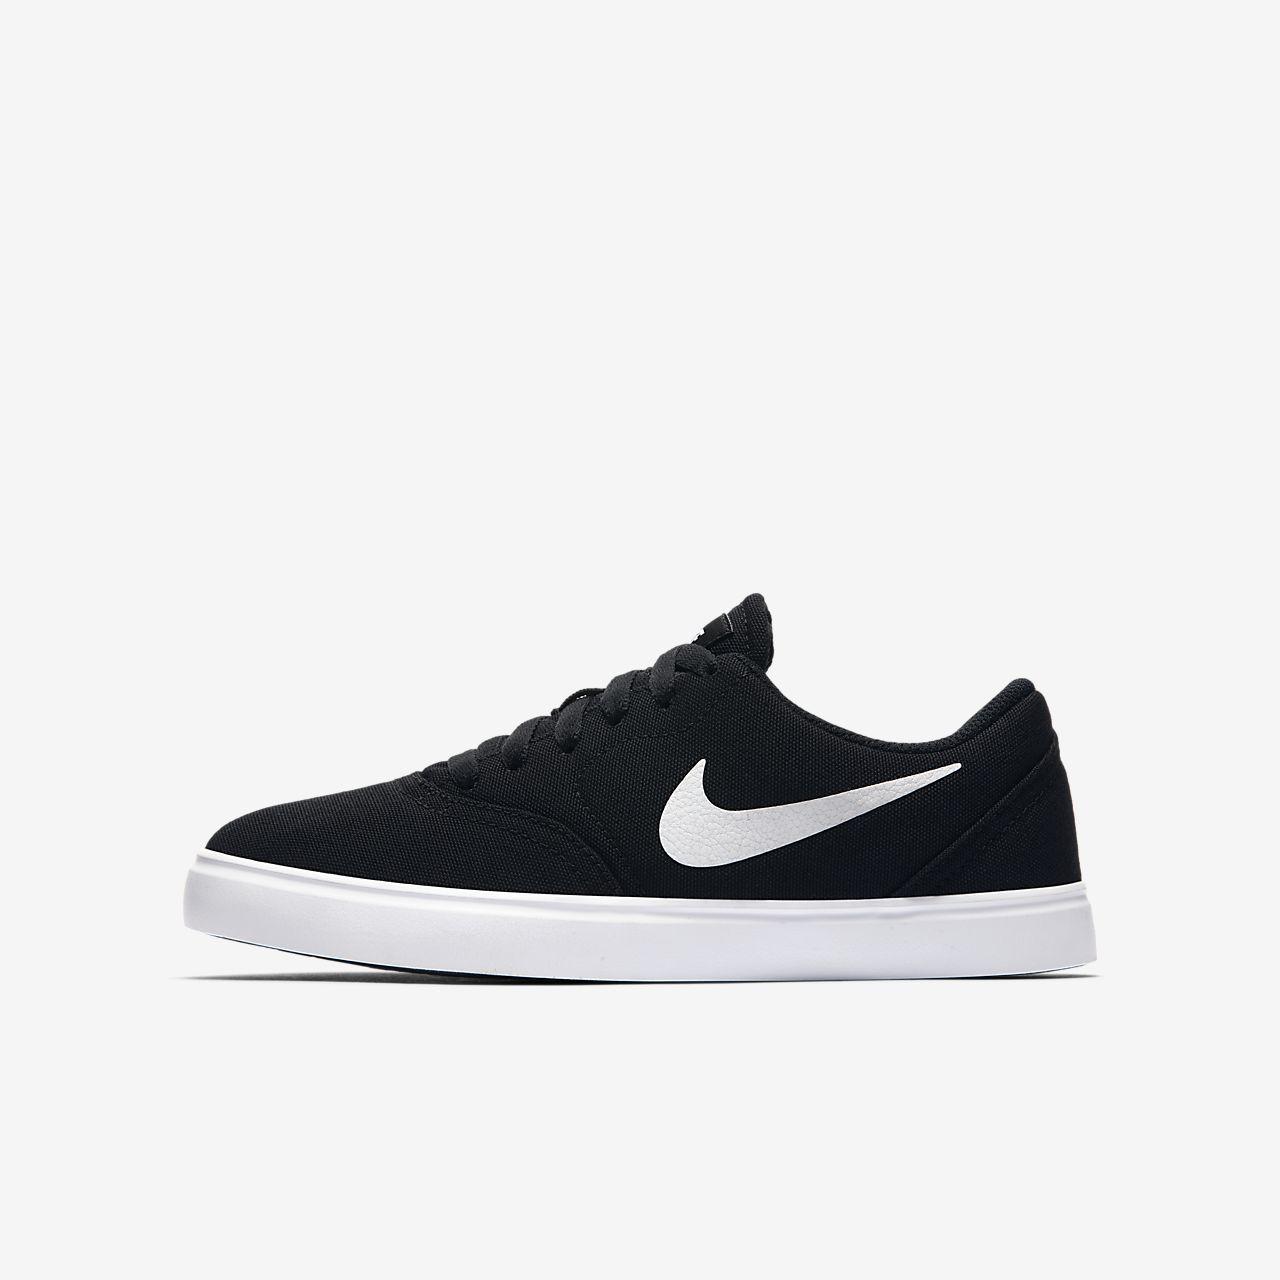 Sapatilhas de skateboard Nike SB Check Canvas Júnior